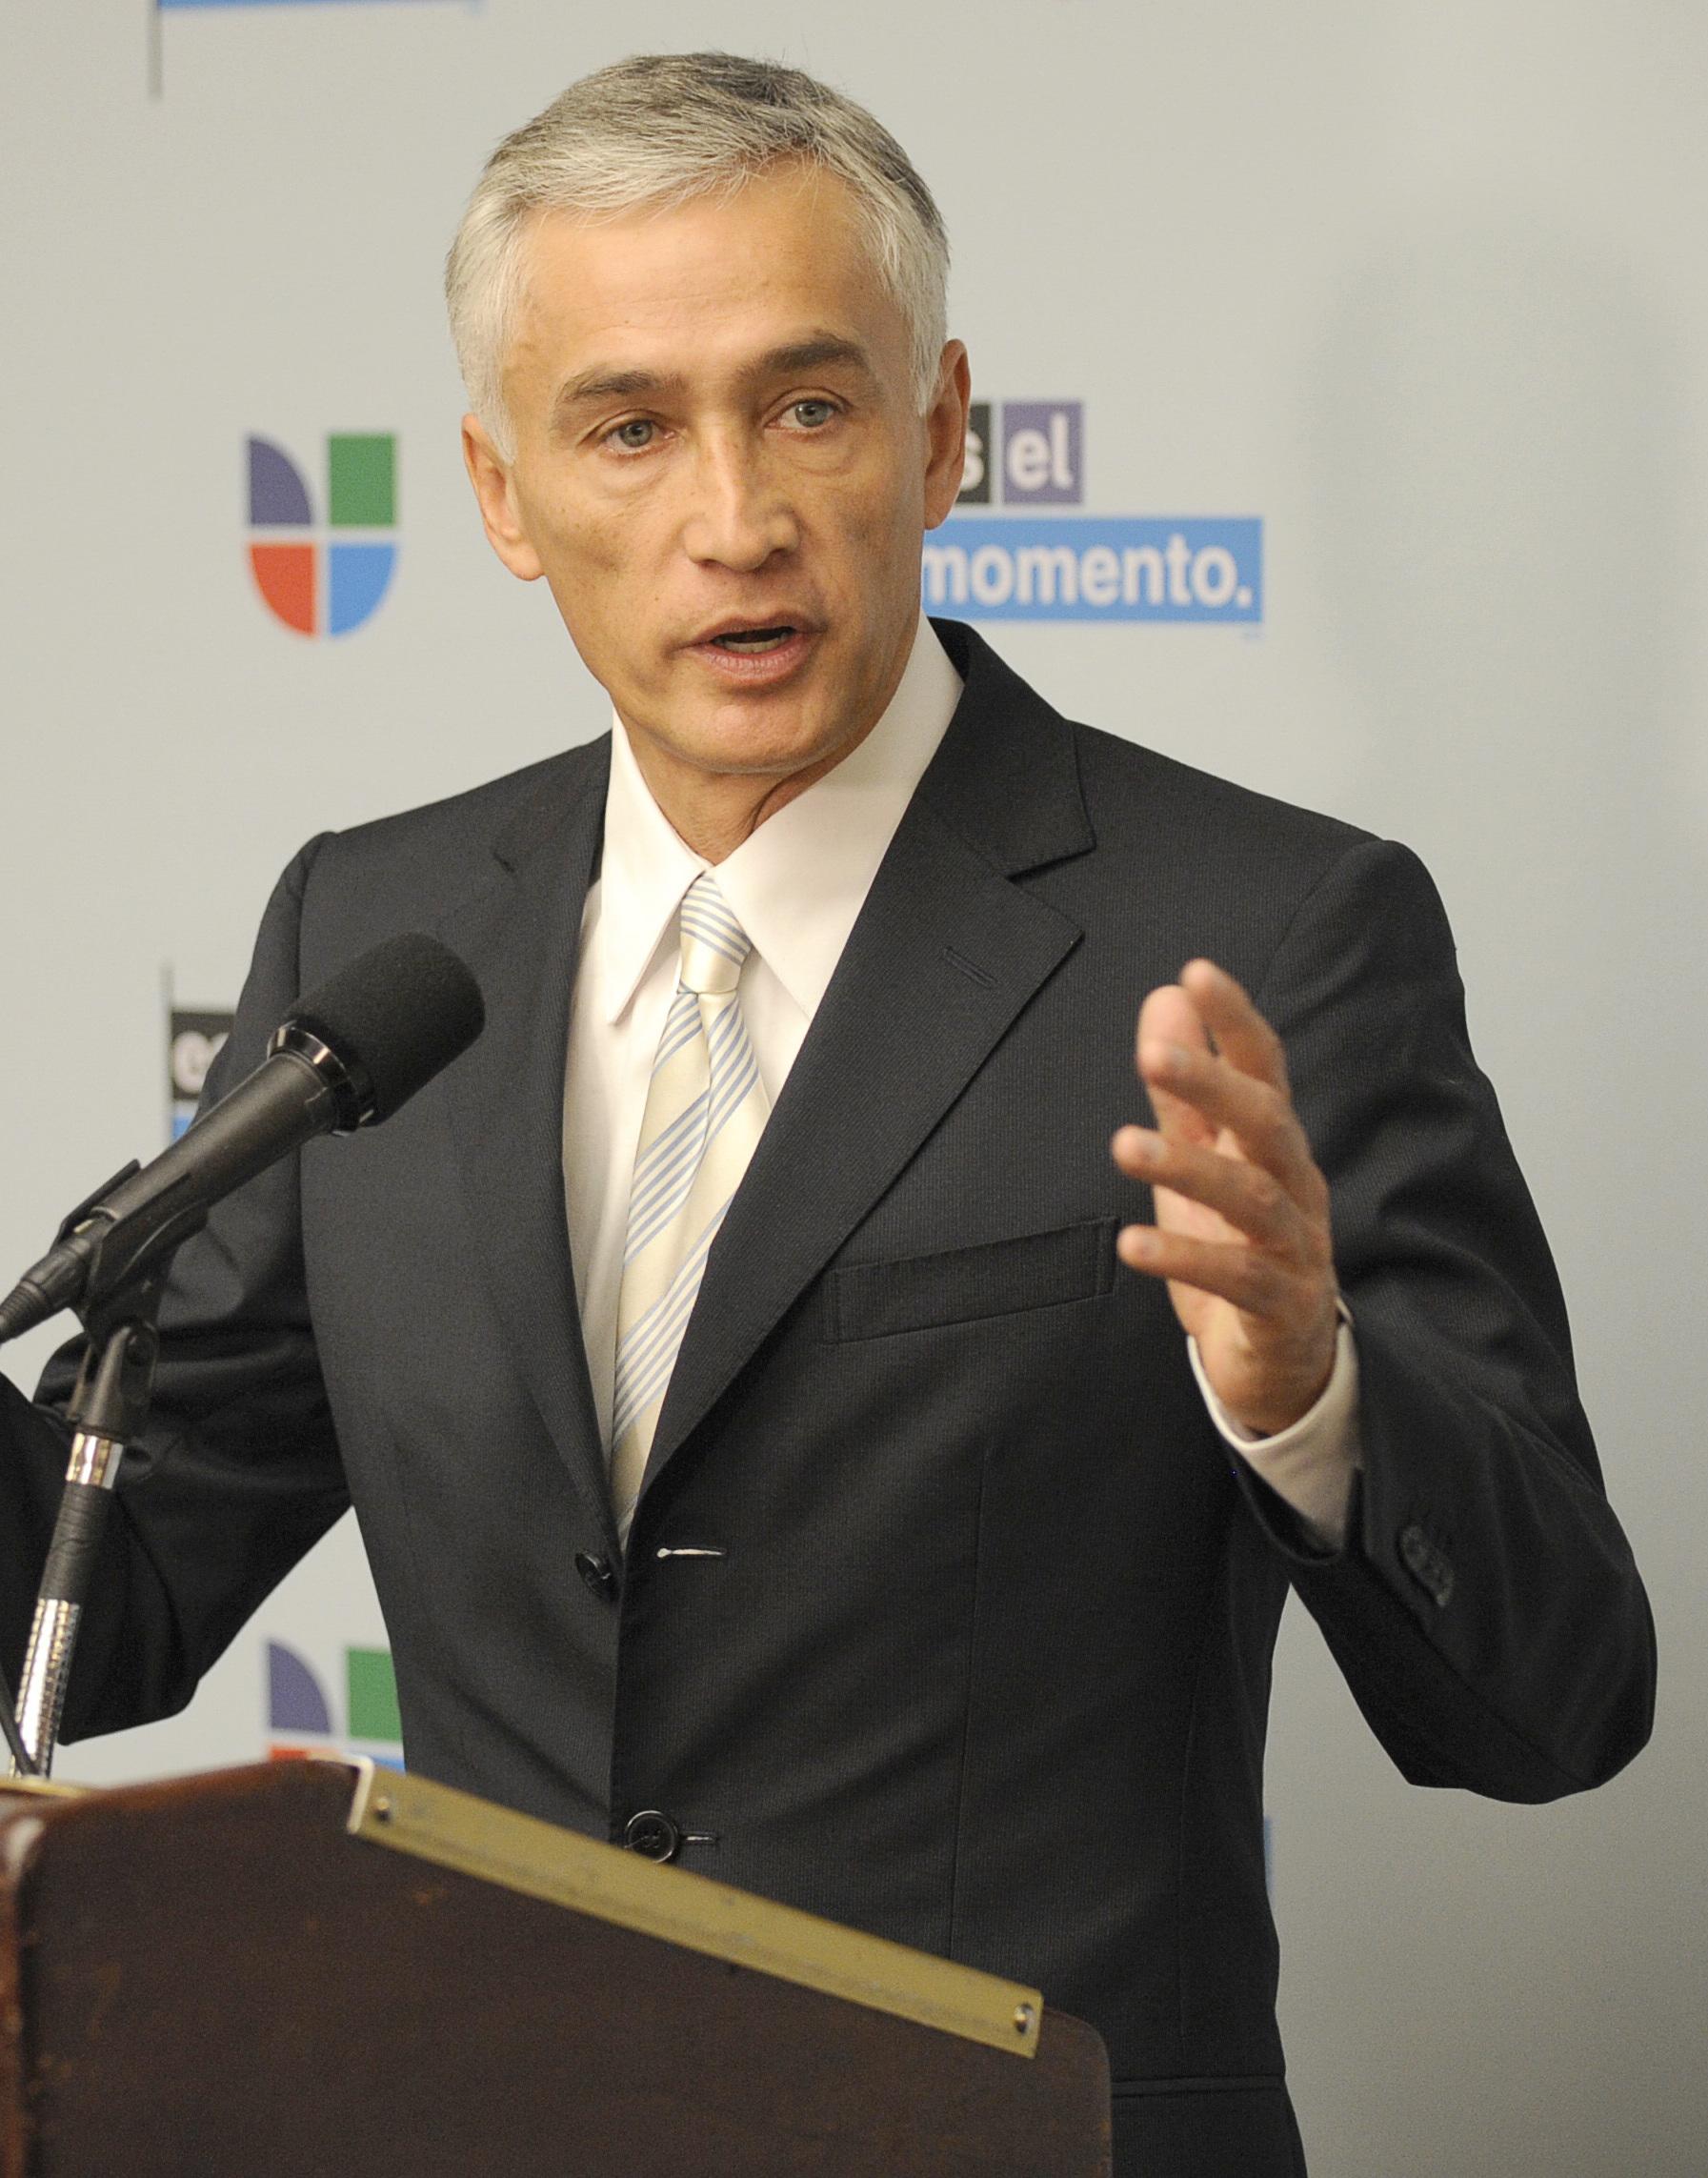 Jorge Ramos (news anchor) - Wikipedia